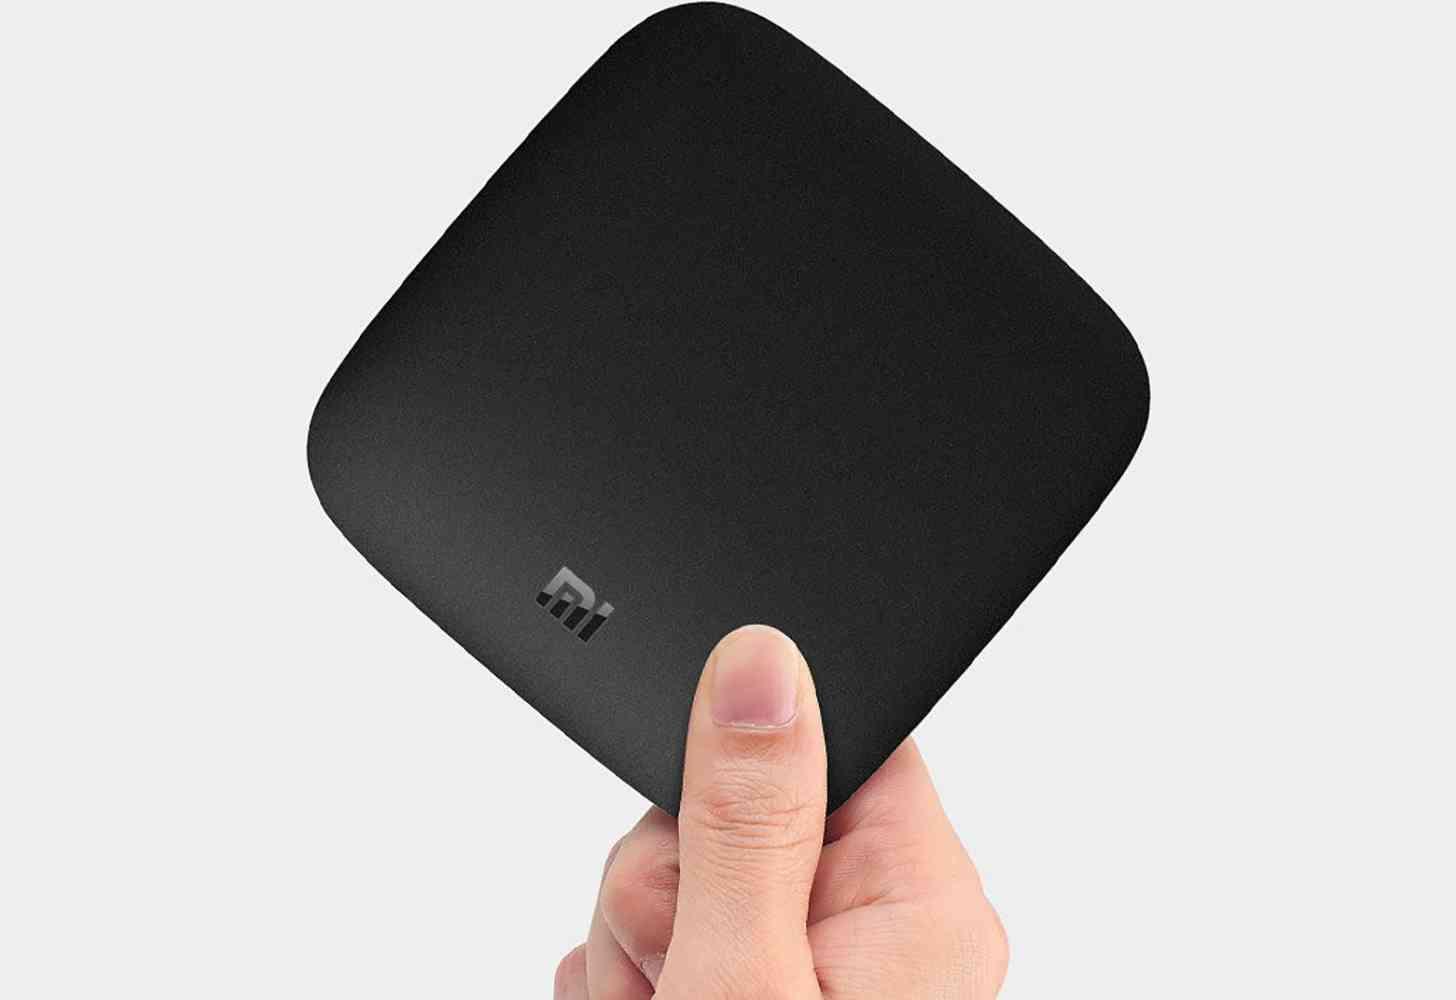 Xiaomi Mi Box Android TV set-top box